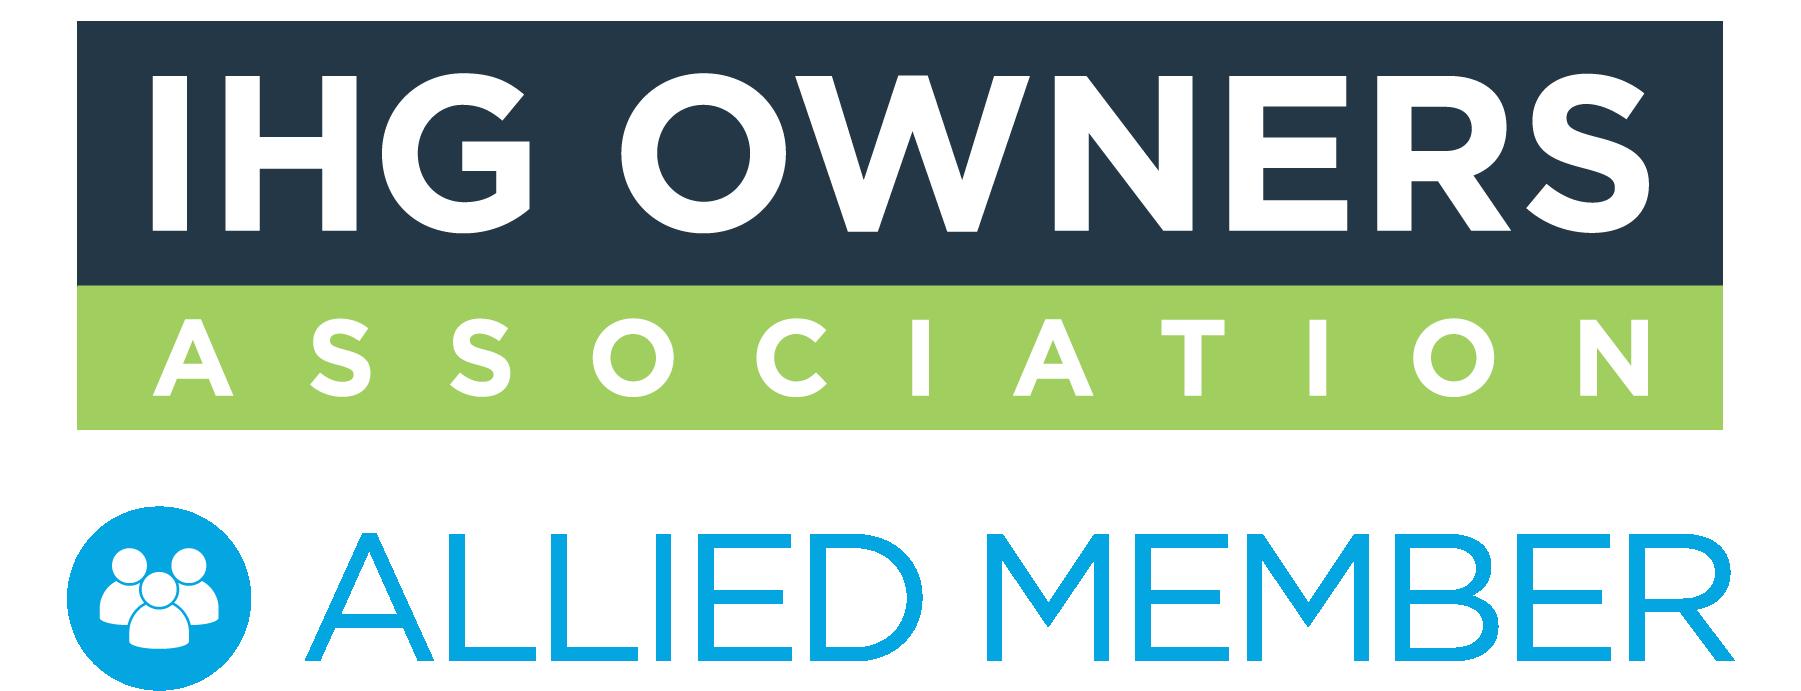 IHG-Owners-Association-Allied-Member